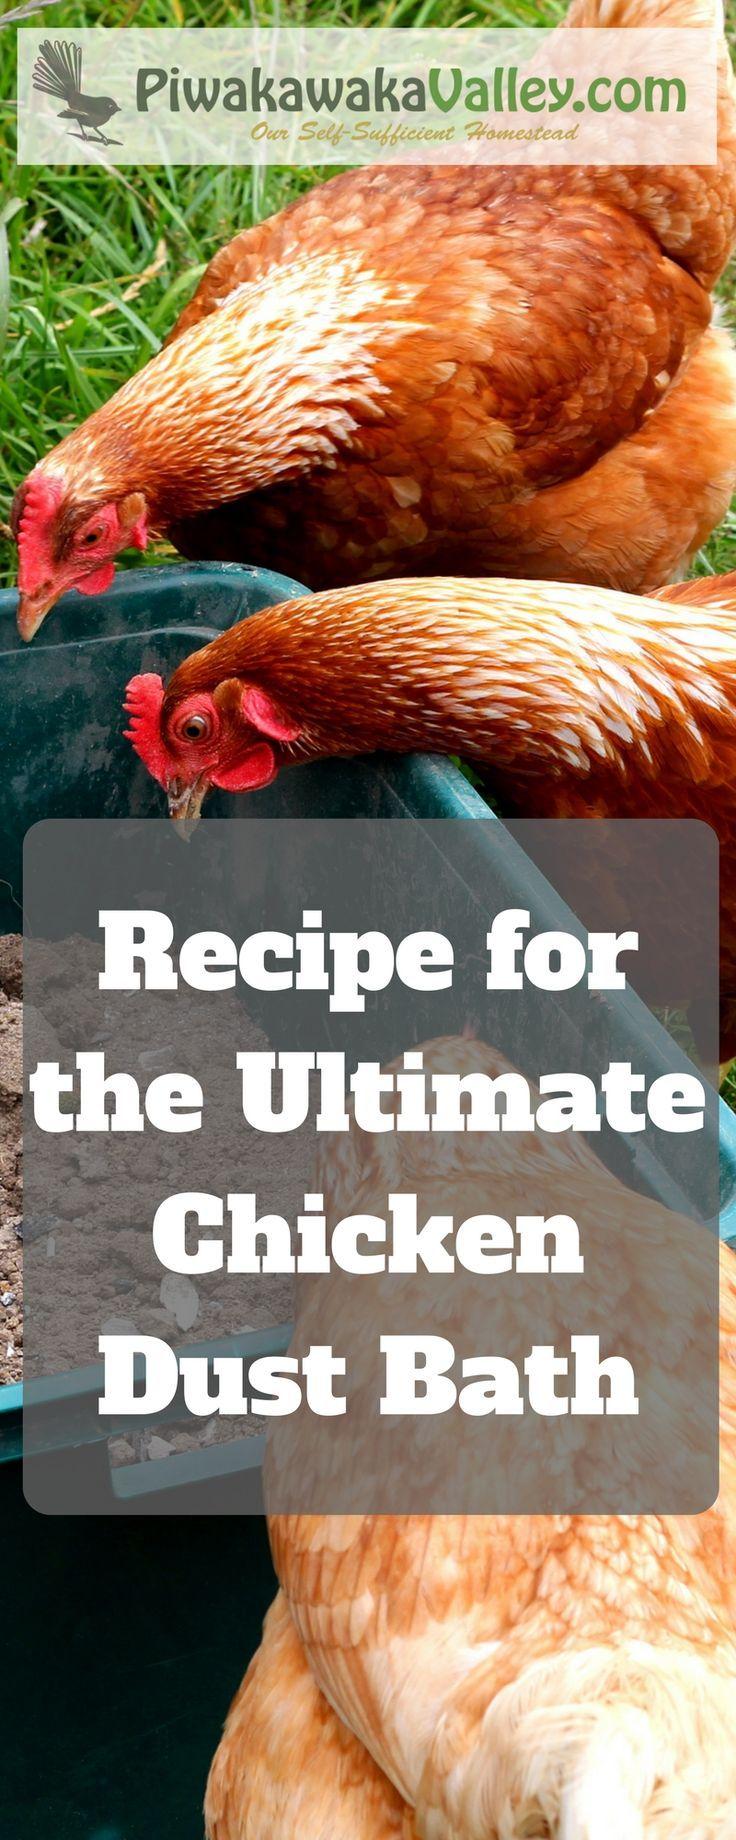 the ultimate chicken and rabbit dust bath recipe backyard